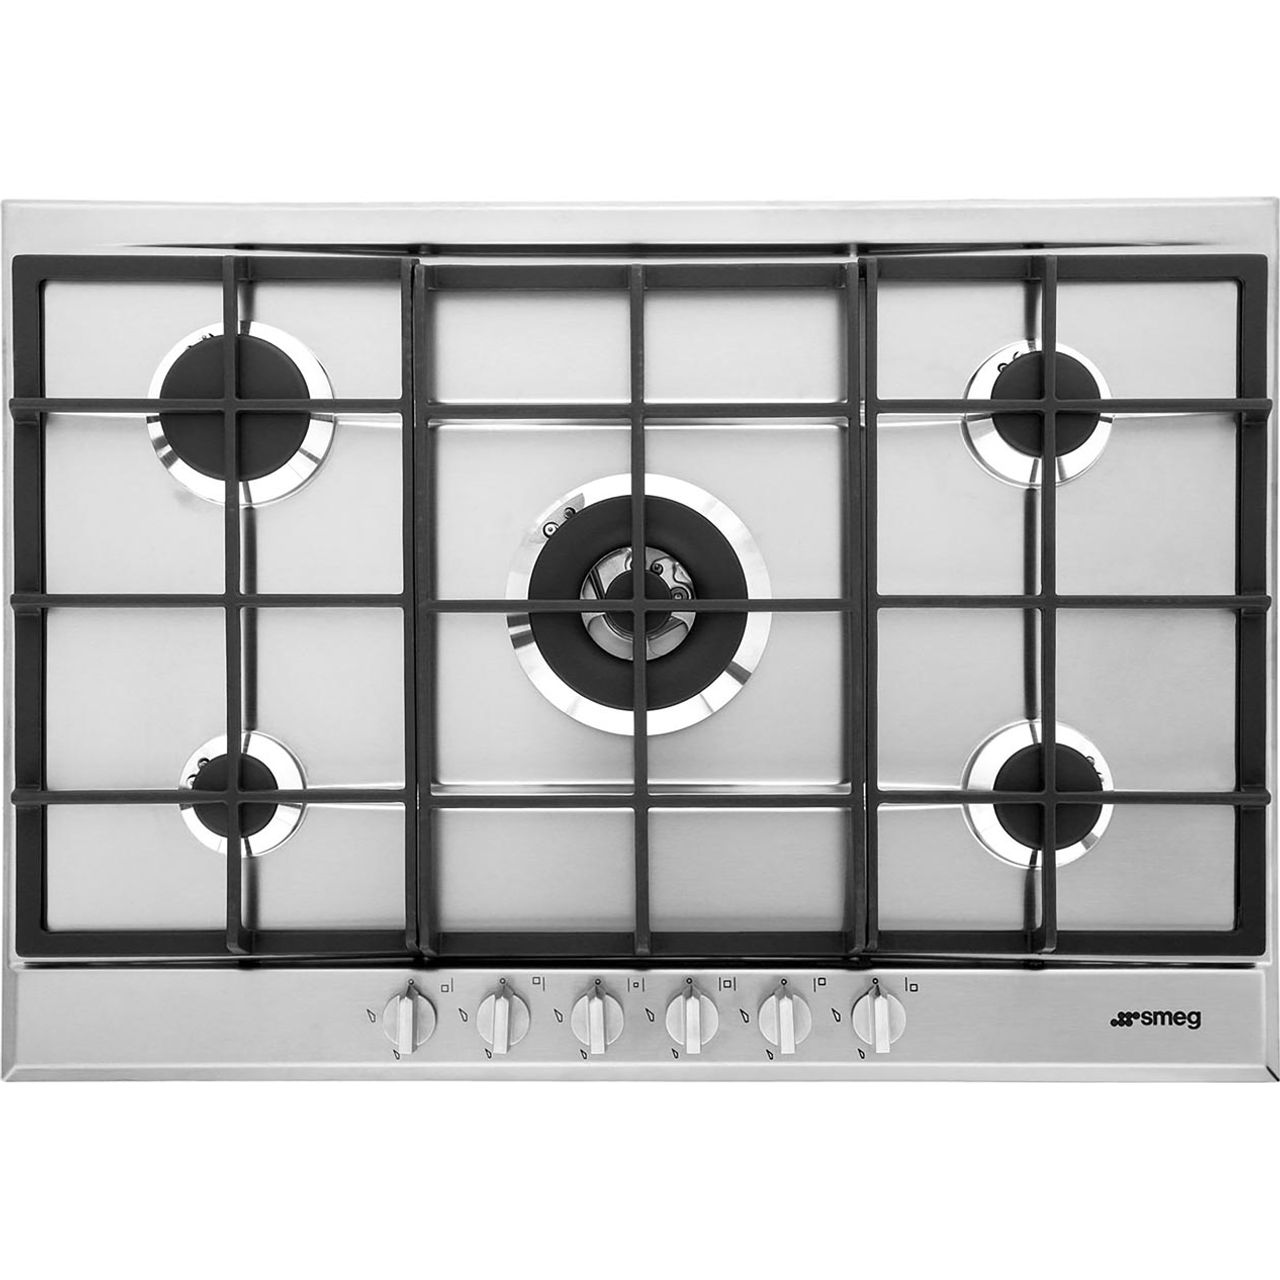 Smeg cucina p272xgh 72cm gas hob stainless steel - Smeg cucina gas ...